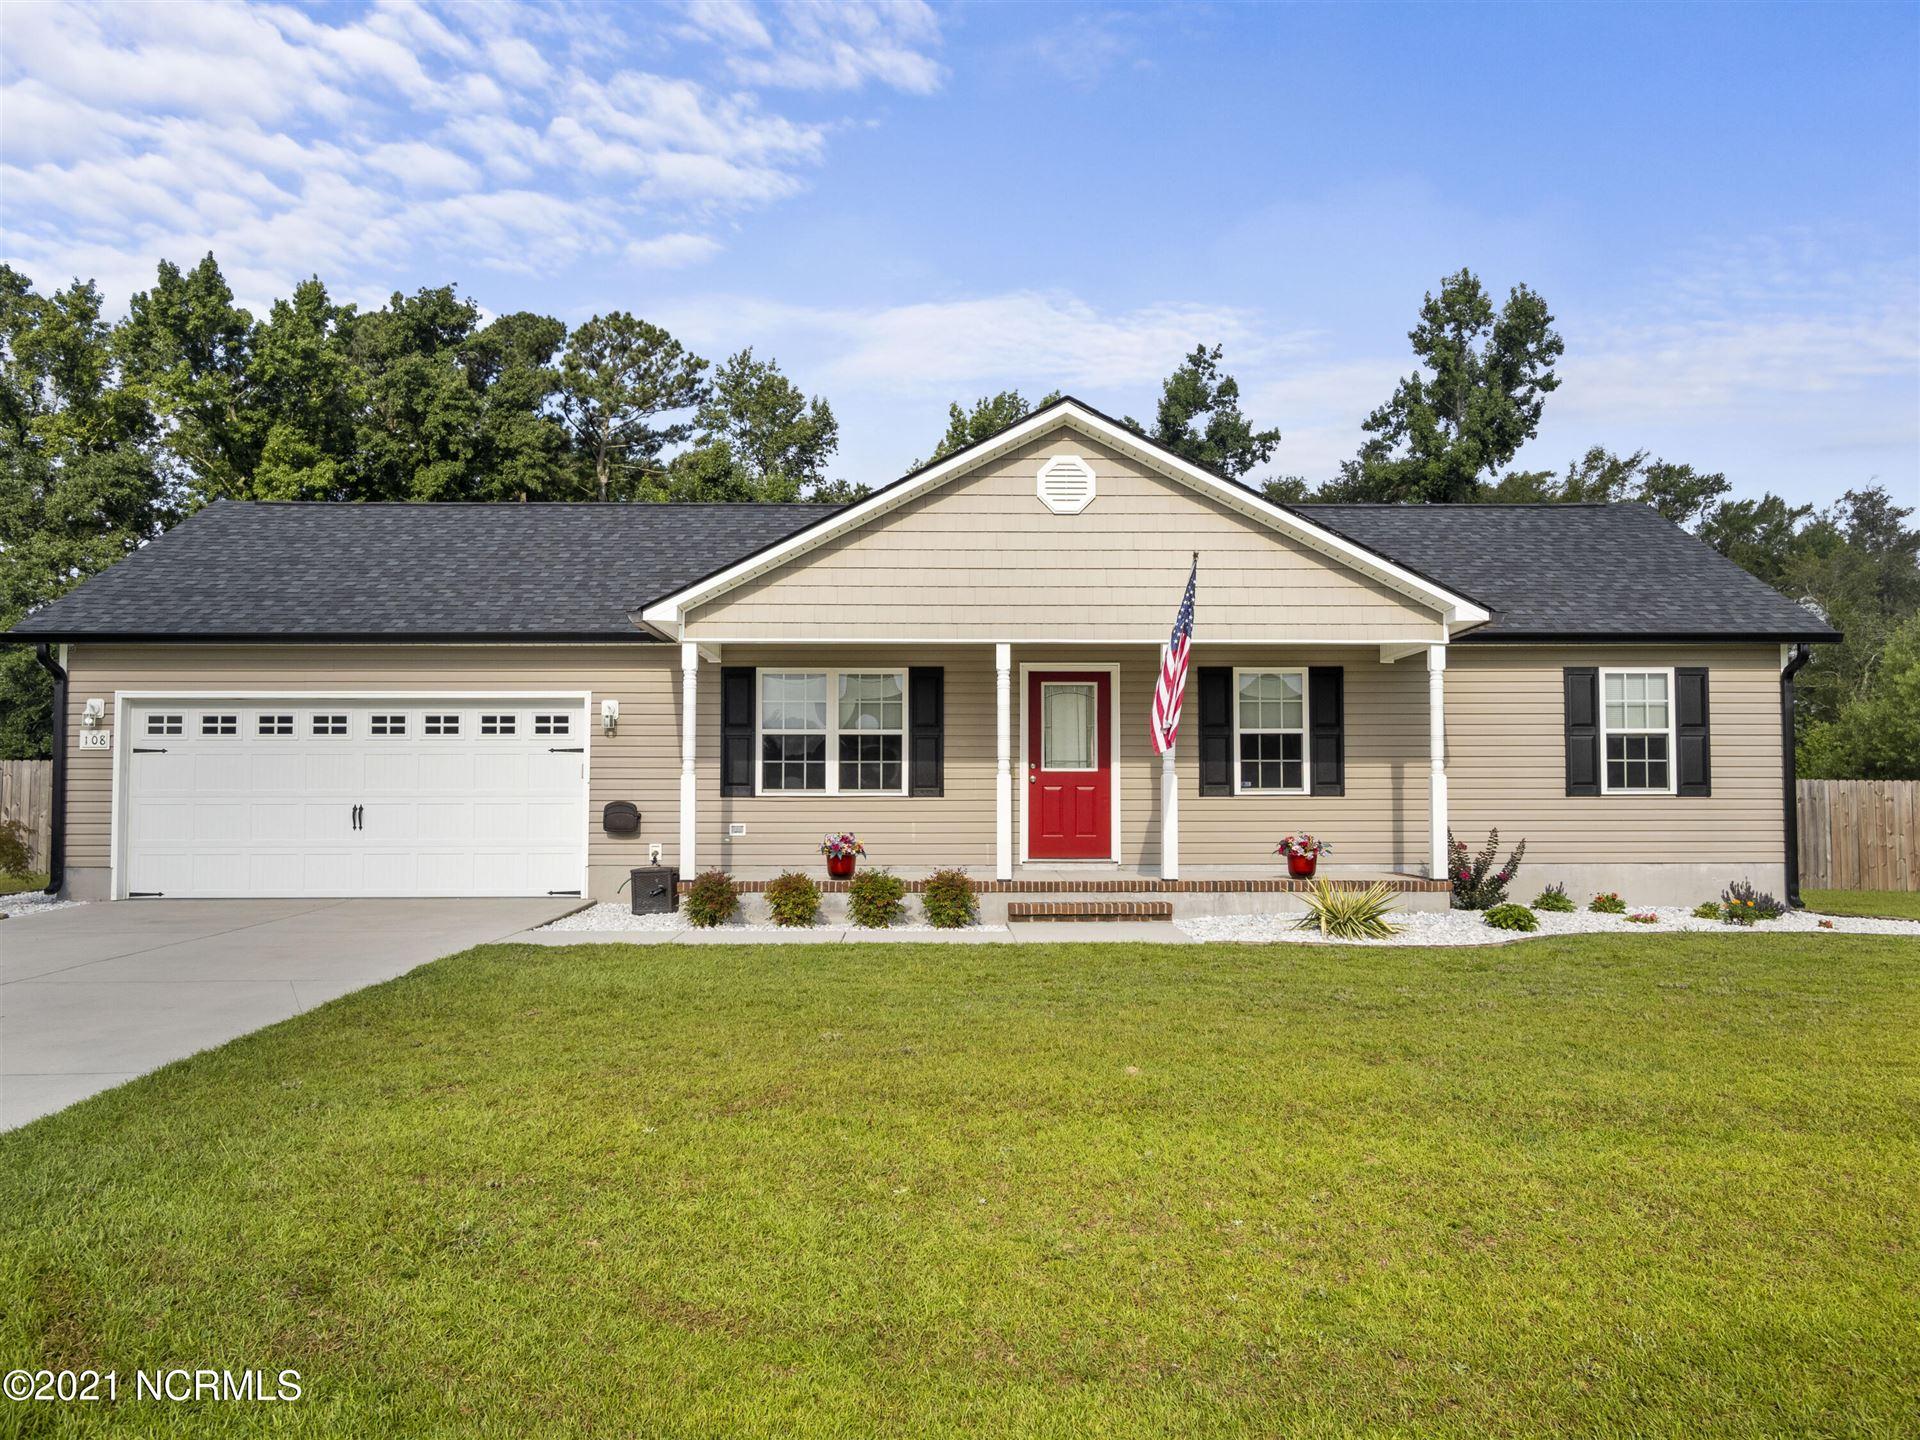 Photo of 108 Eagle Ridge Drive, Beulaville, NC 28518 (MLS # 100284379)